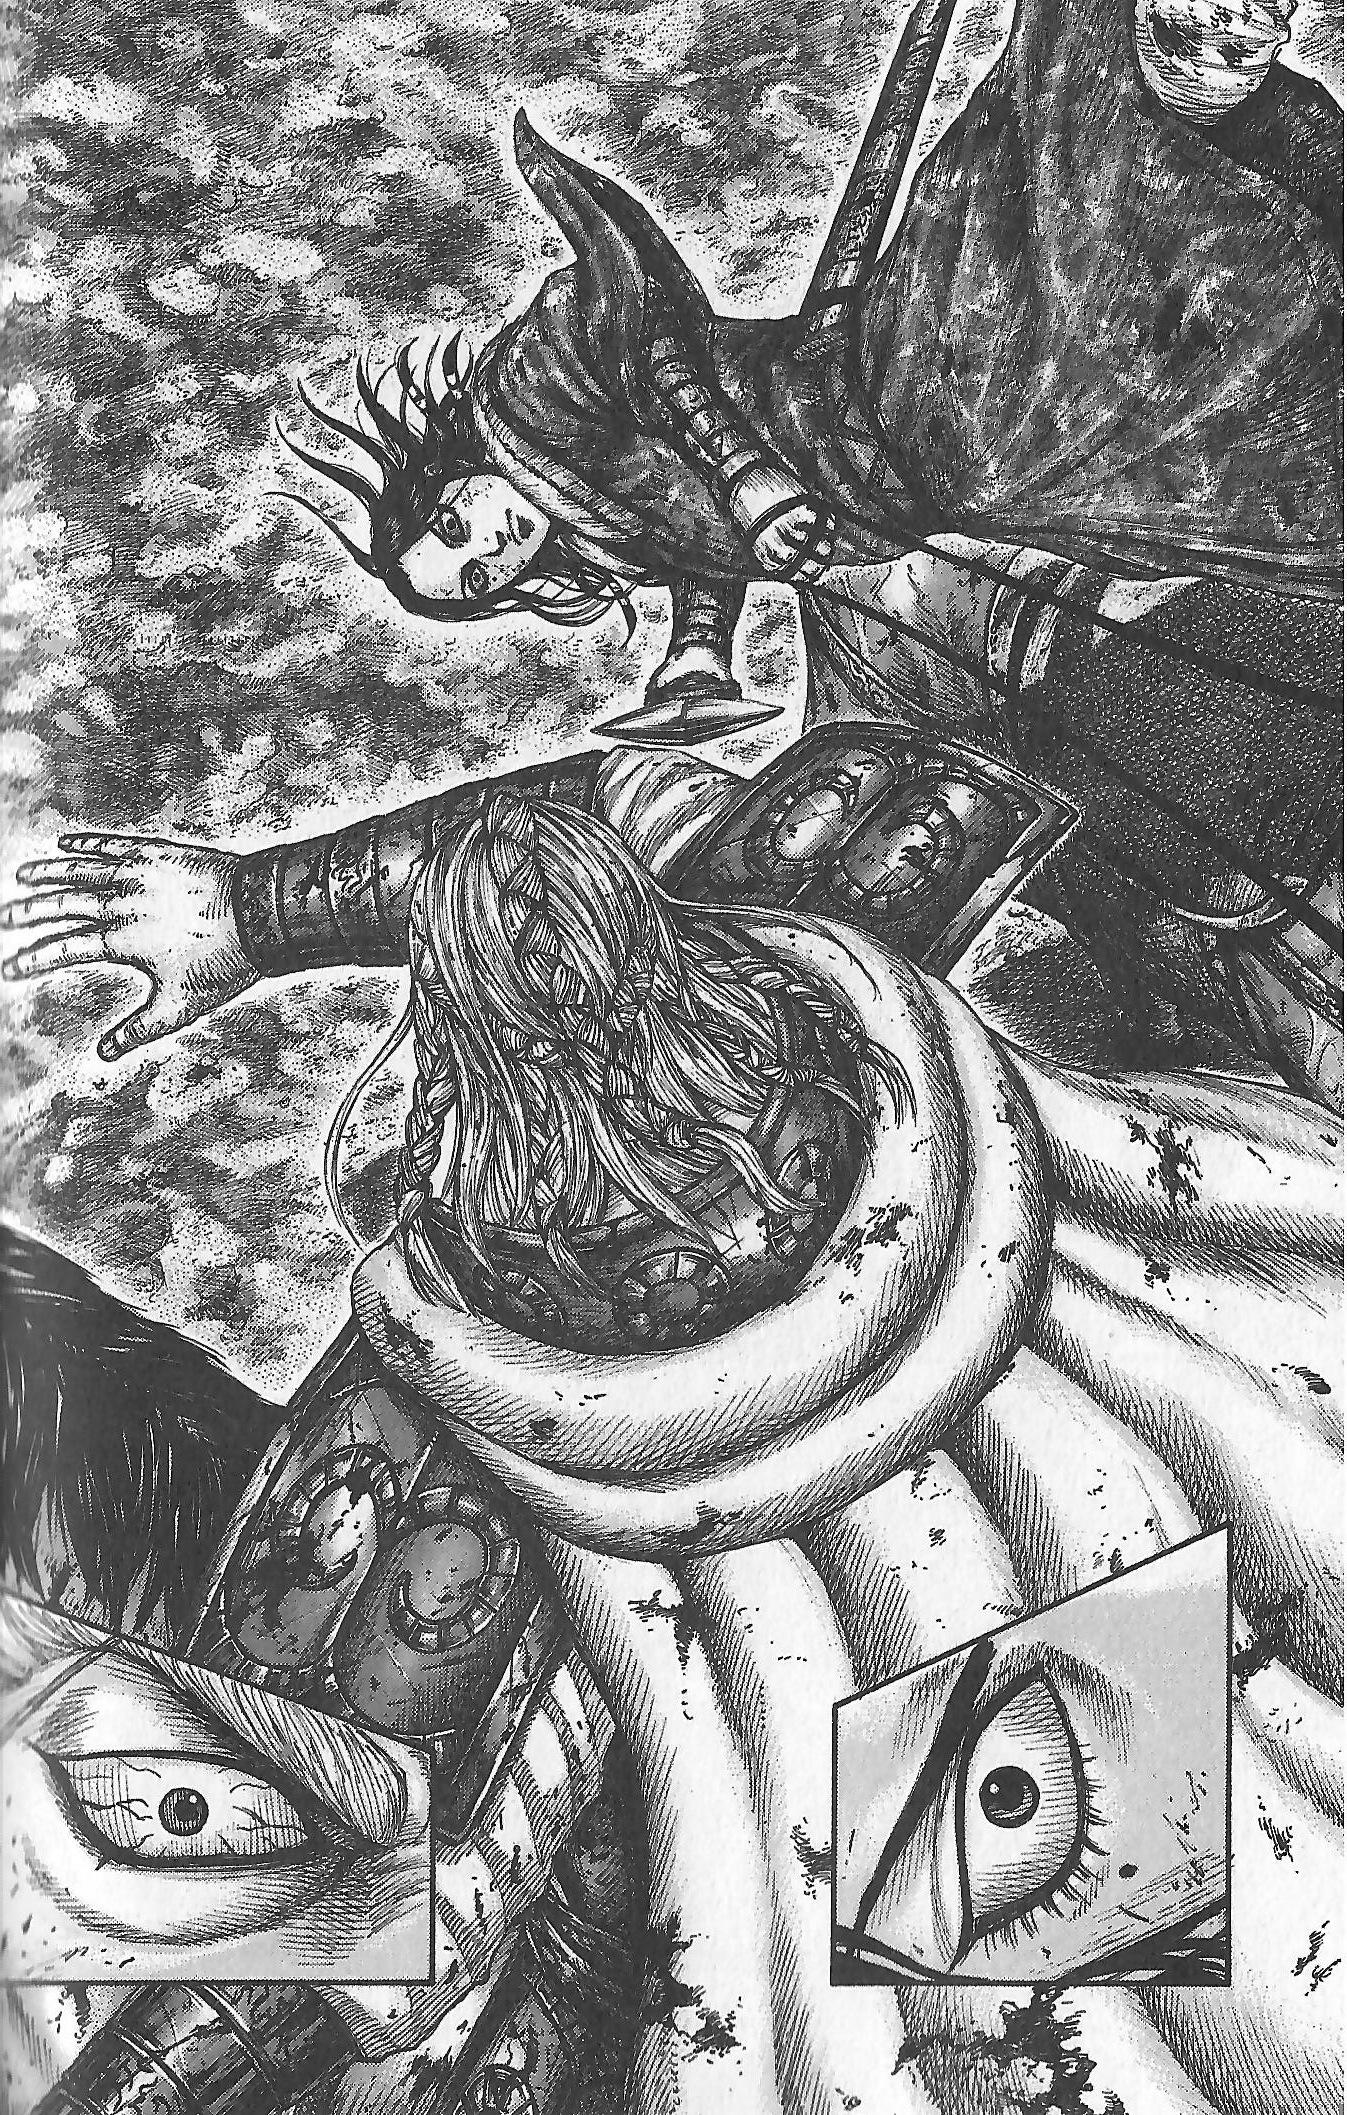 Kingdom - combat